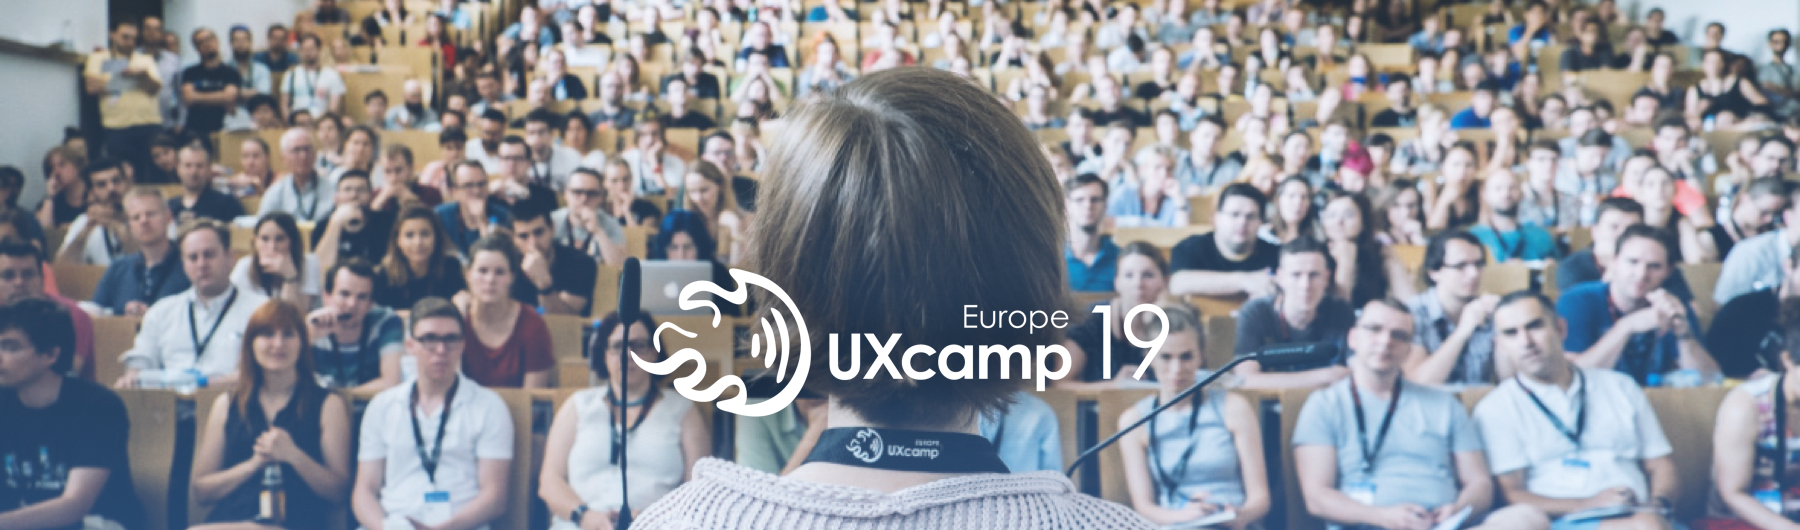 UXcamp Europe 2019